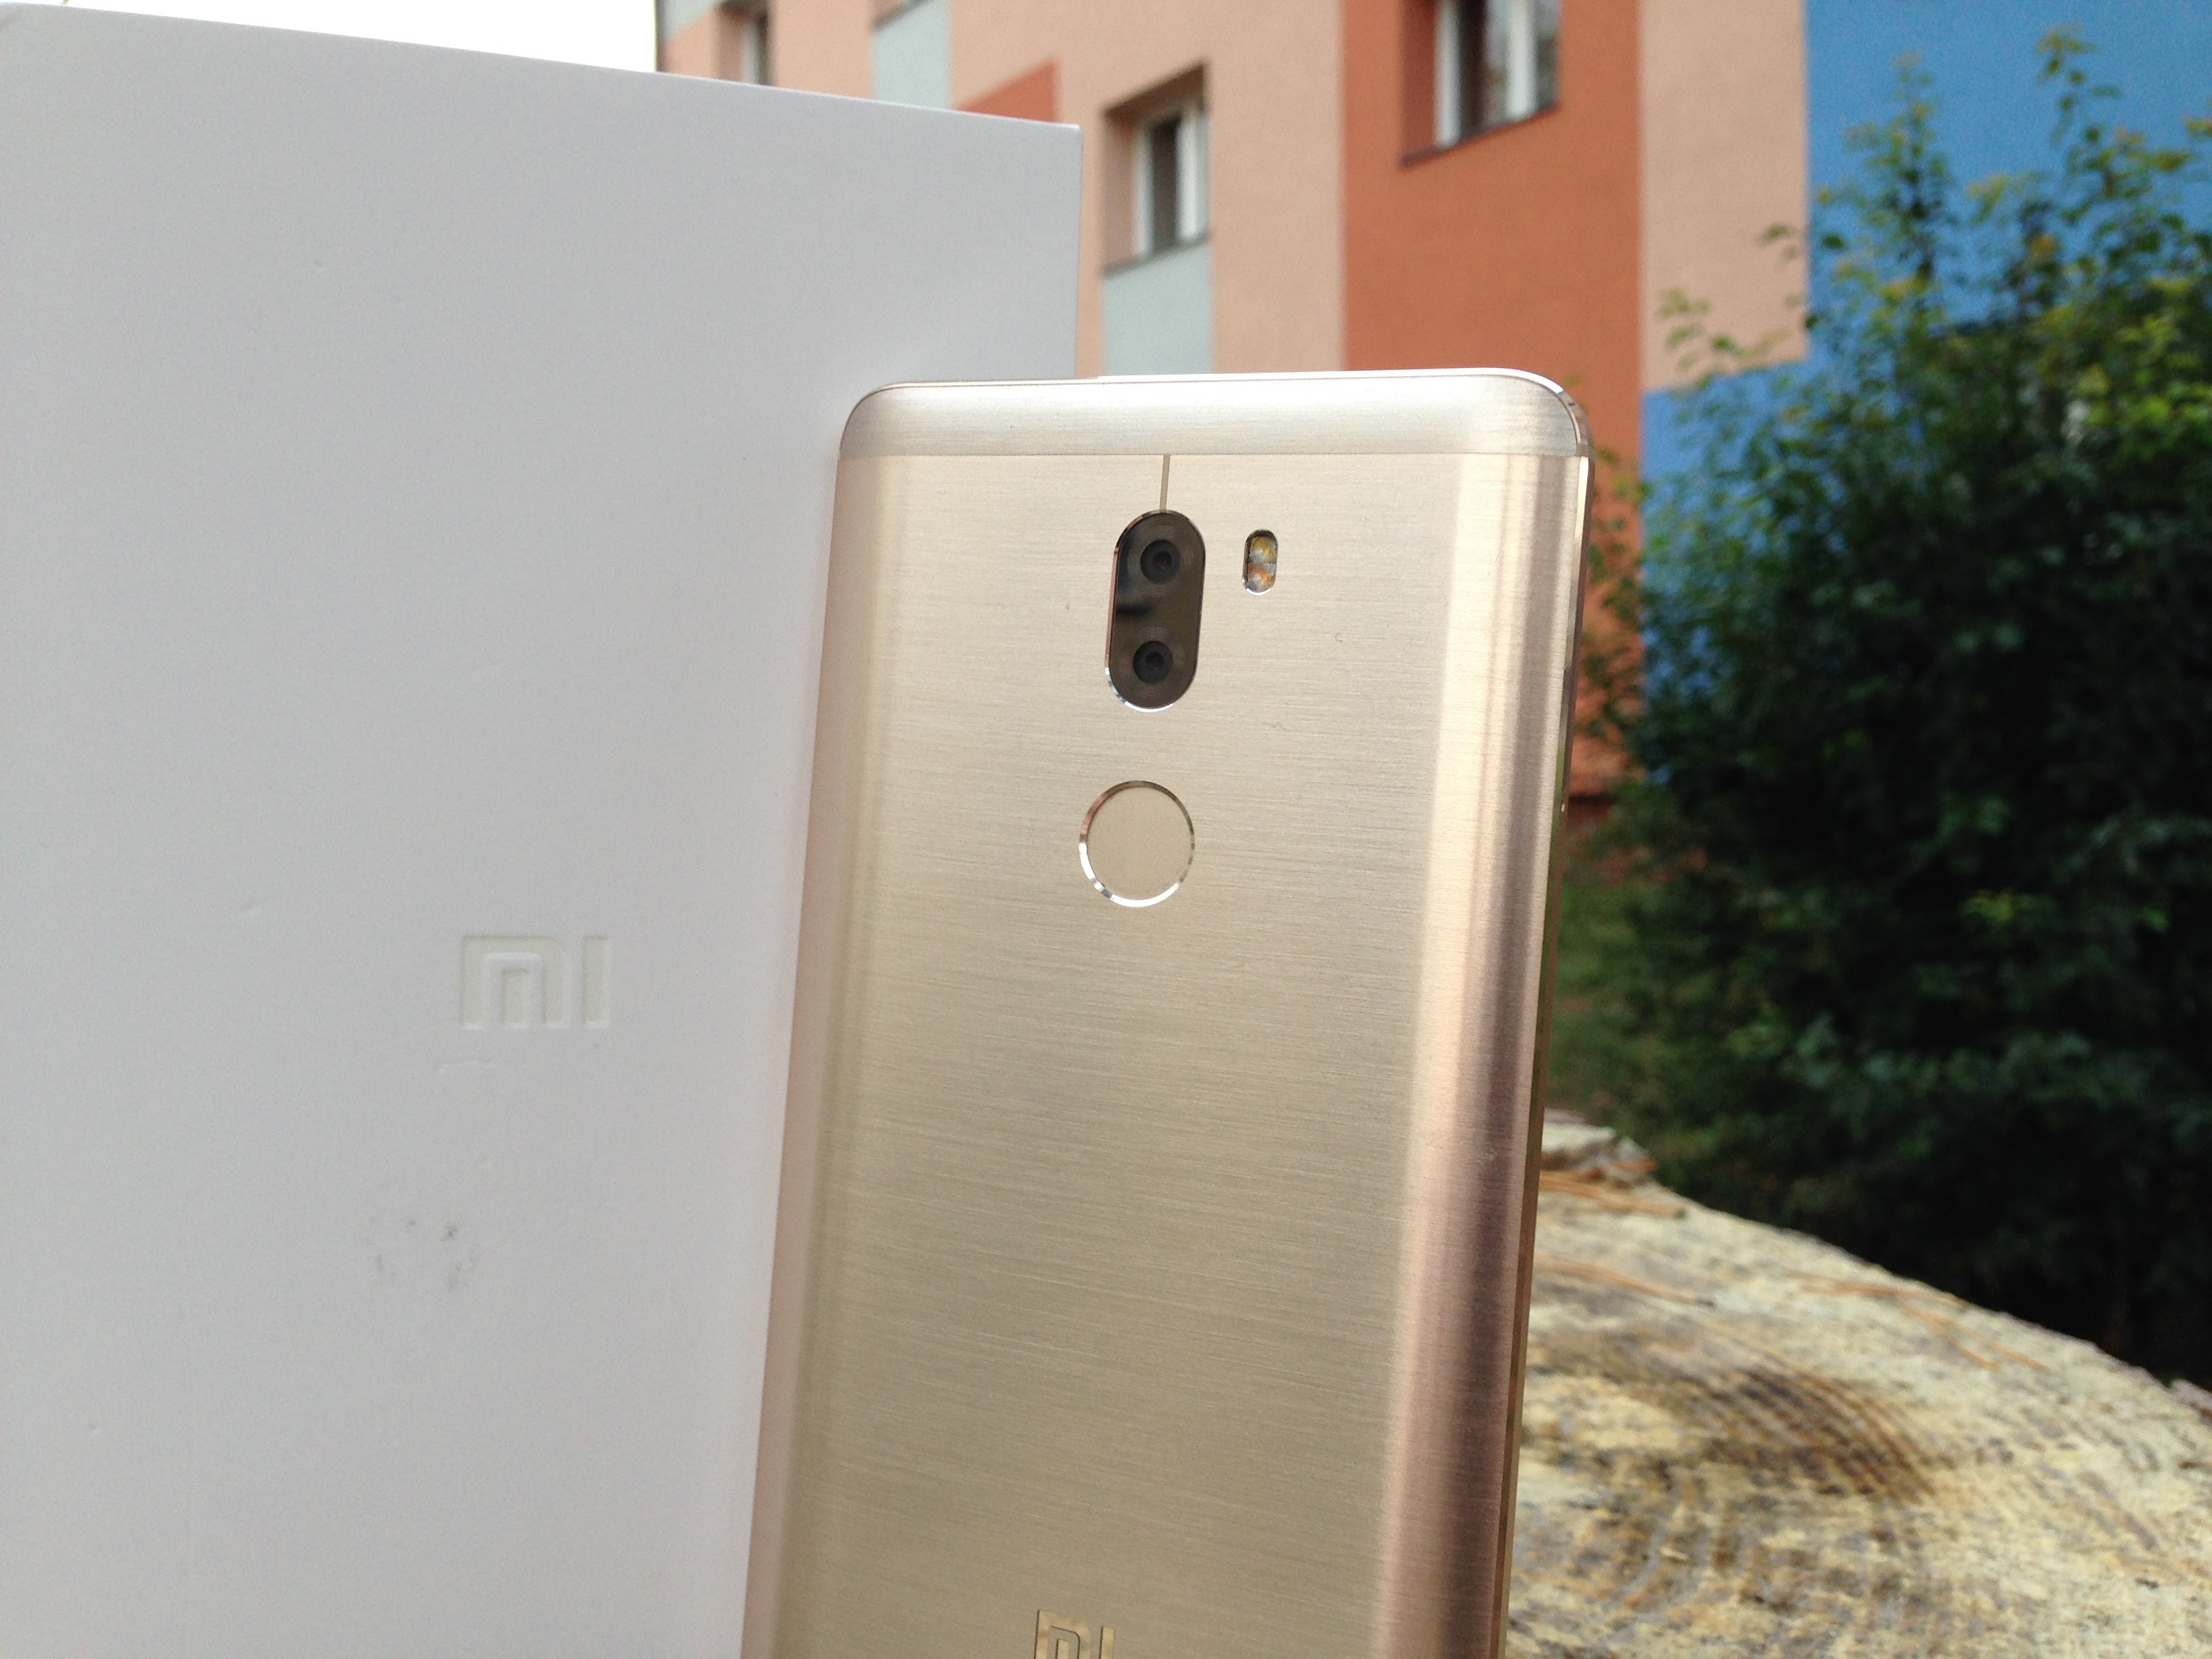 Xiaomi Mi 5s Plus – dvojočko a odladěný systém [recenze]